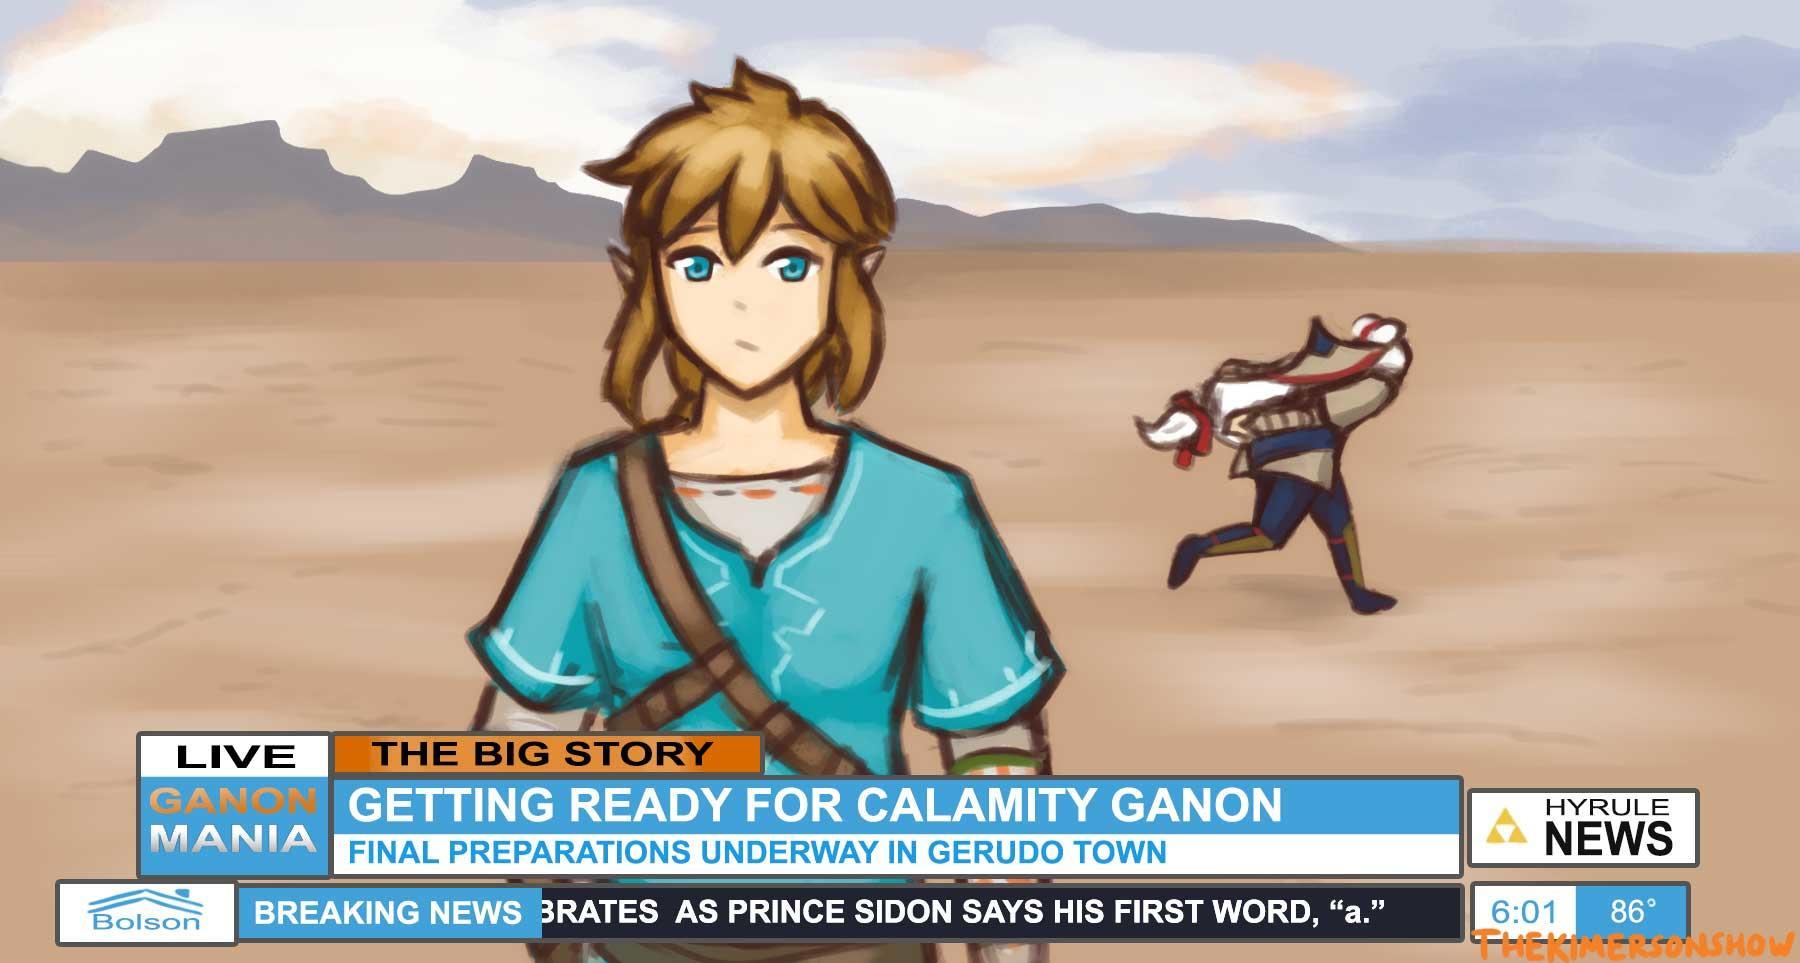 Impa S Naruto Run The Legend Of Zelda Breath Of The Wild Know Your Meme